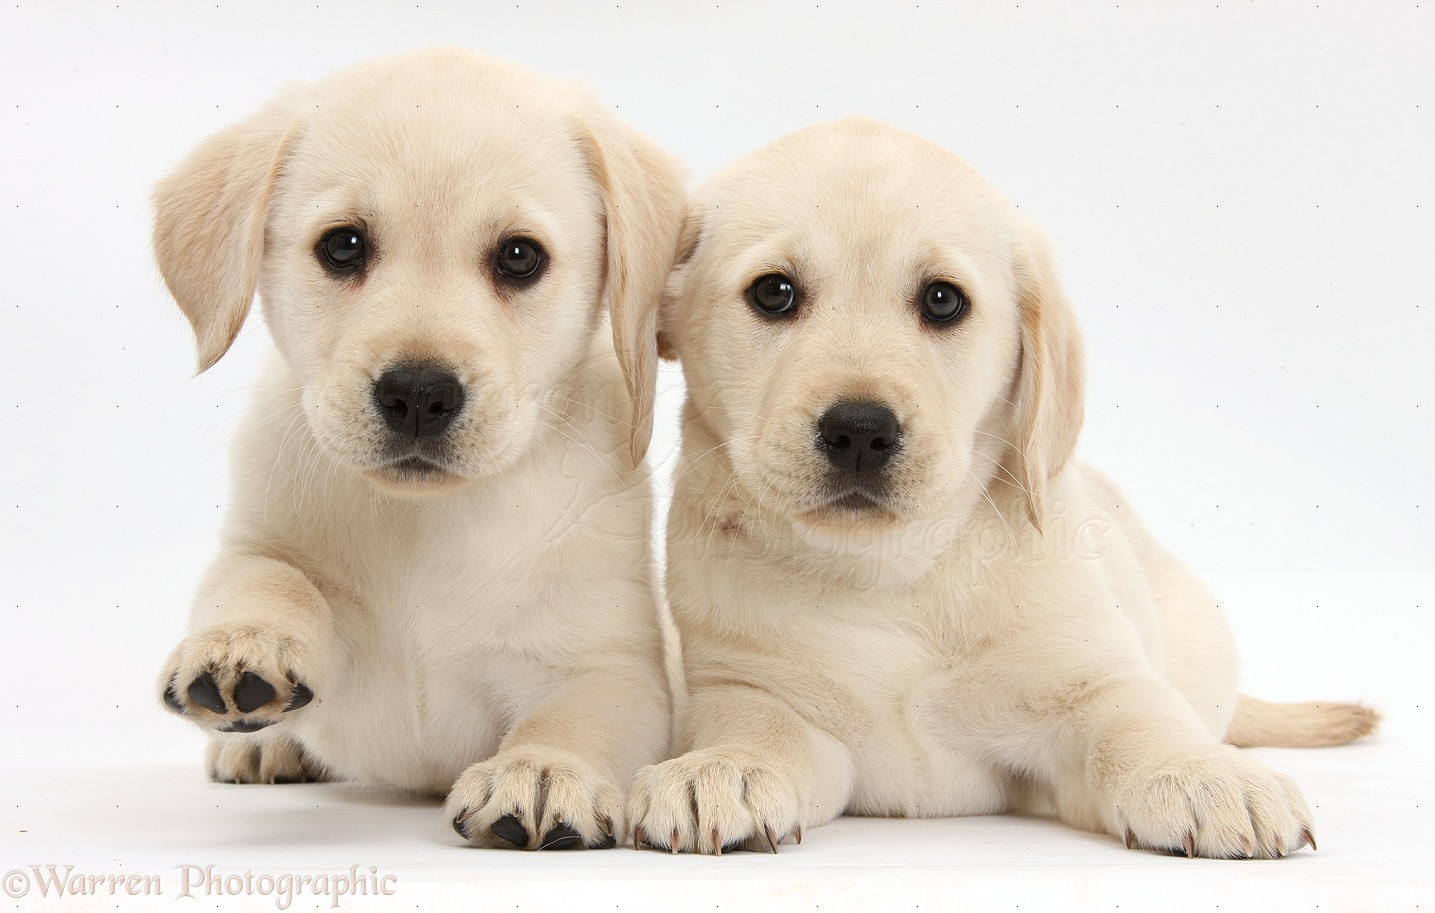 Yellow Labrador Retriever Puppies 8 Weeks Old